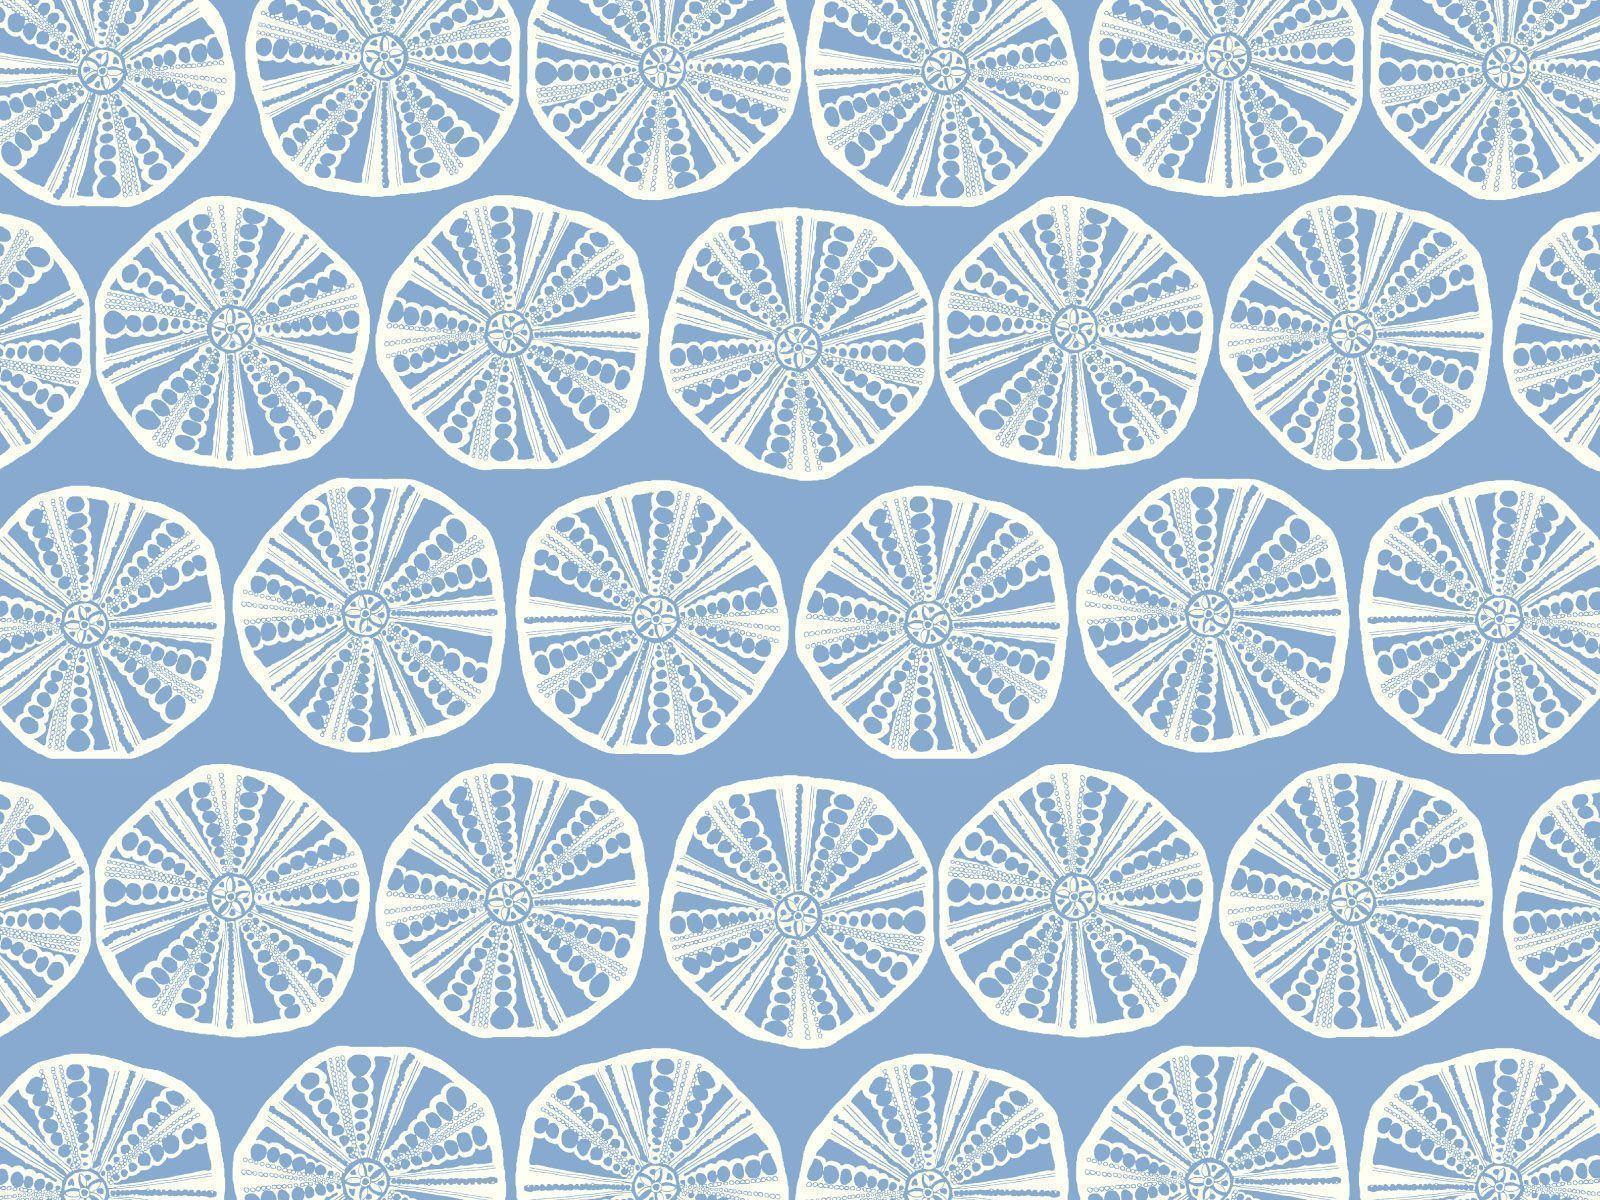 Pattern Desktop Wallpapers Top Free Pattern Desktop Backgrounds Wallpaperaccess